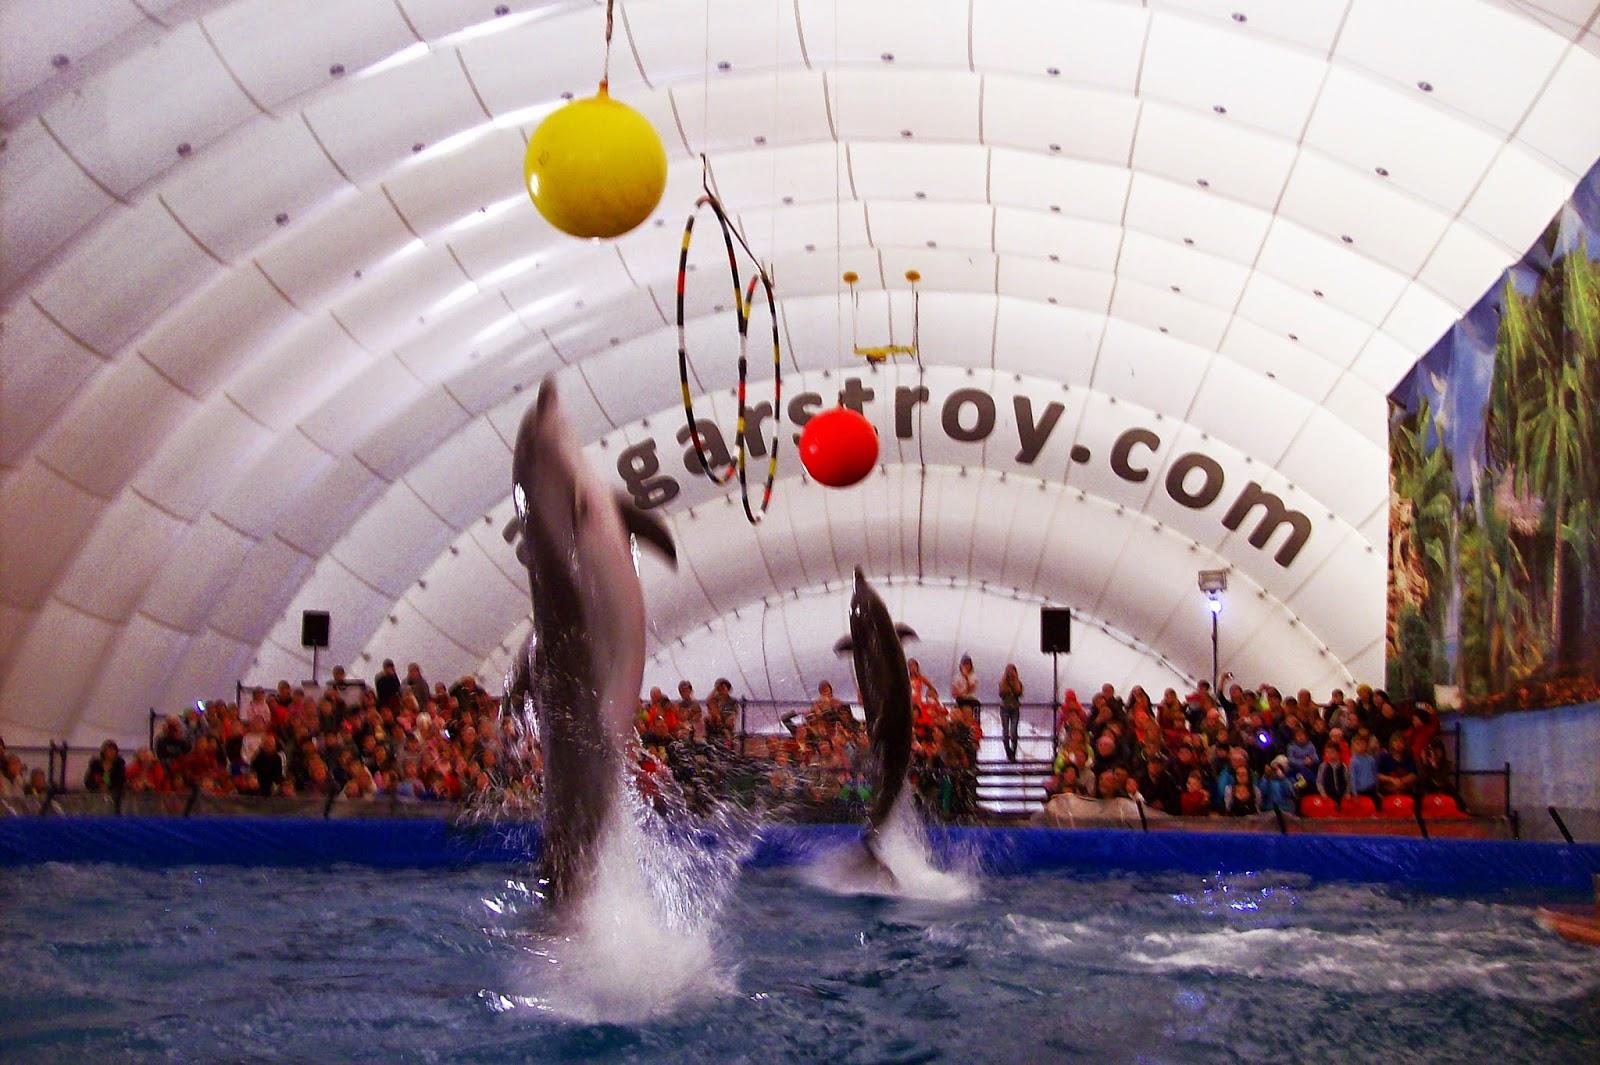 красавцы - дельфины